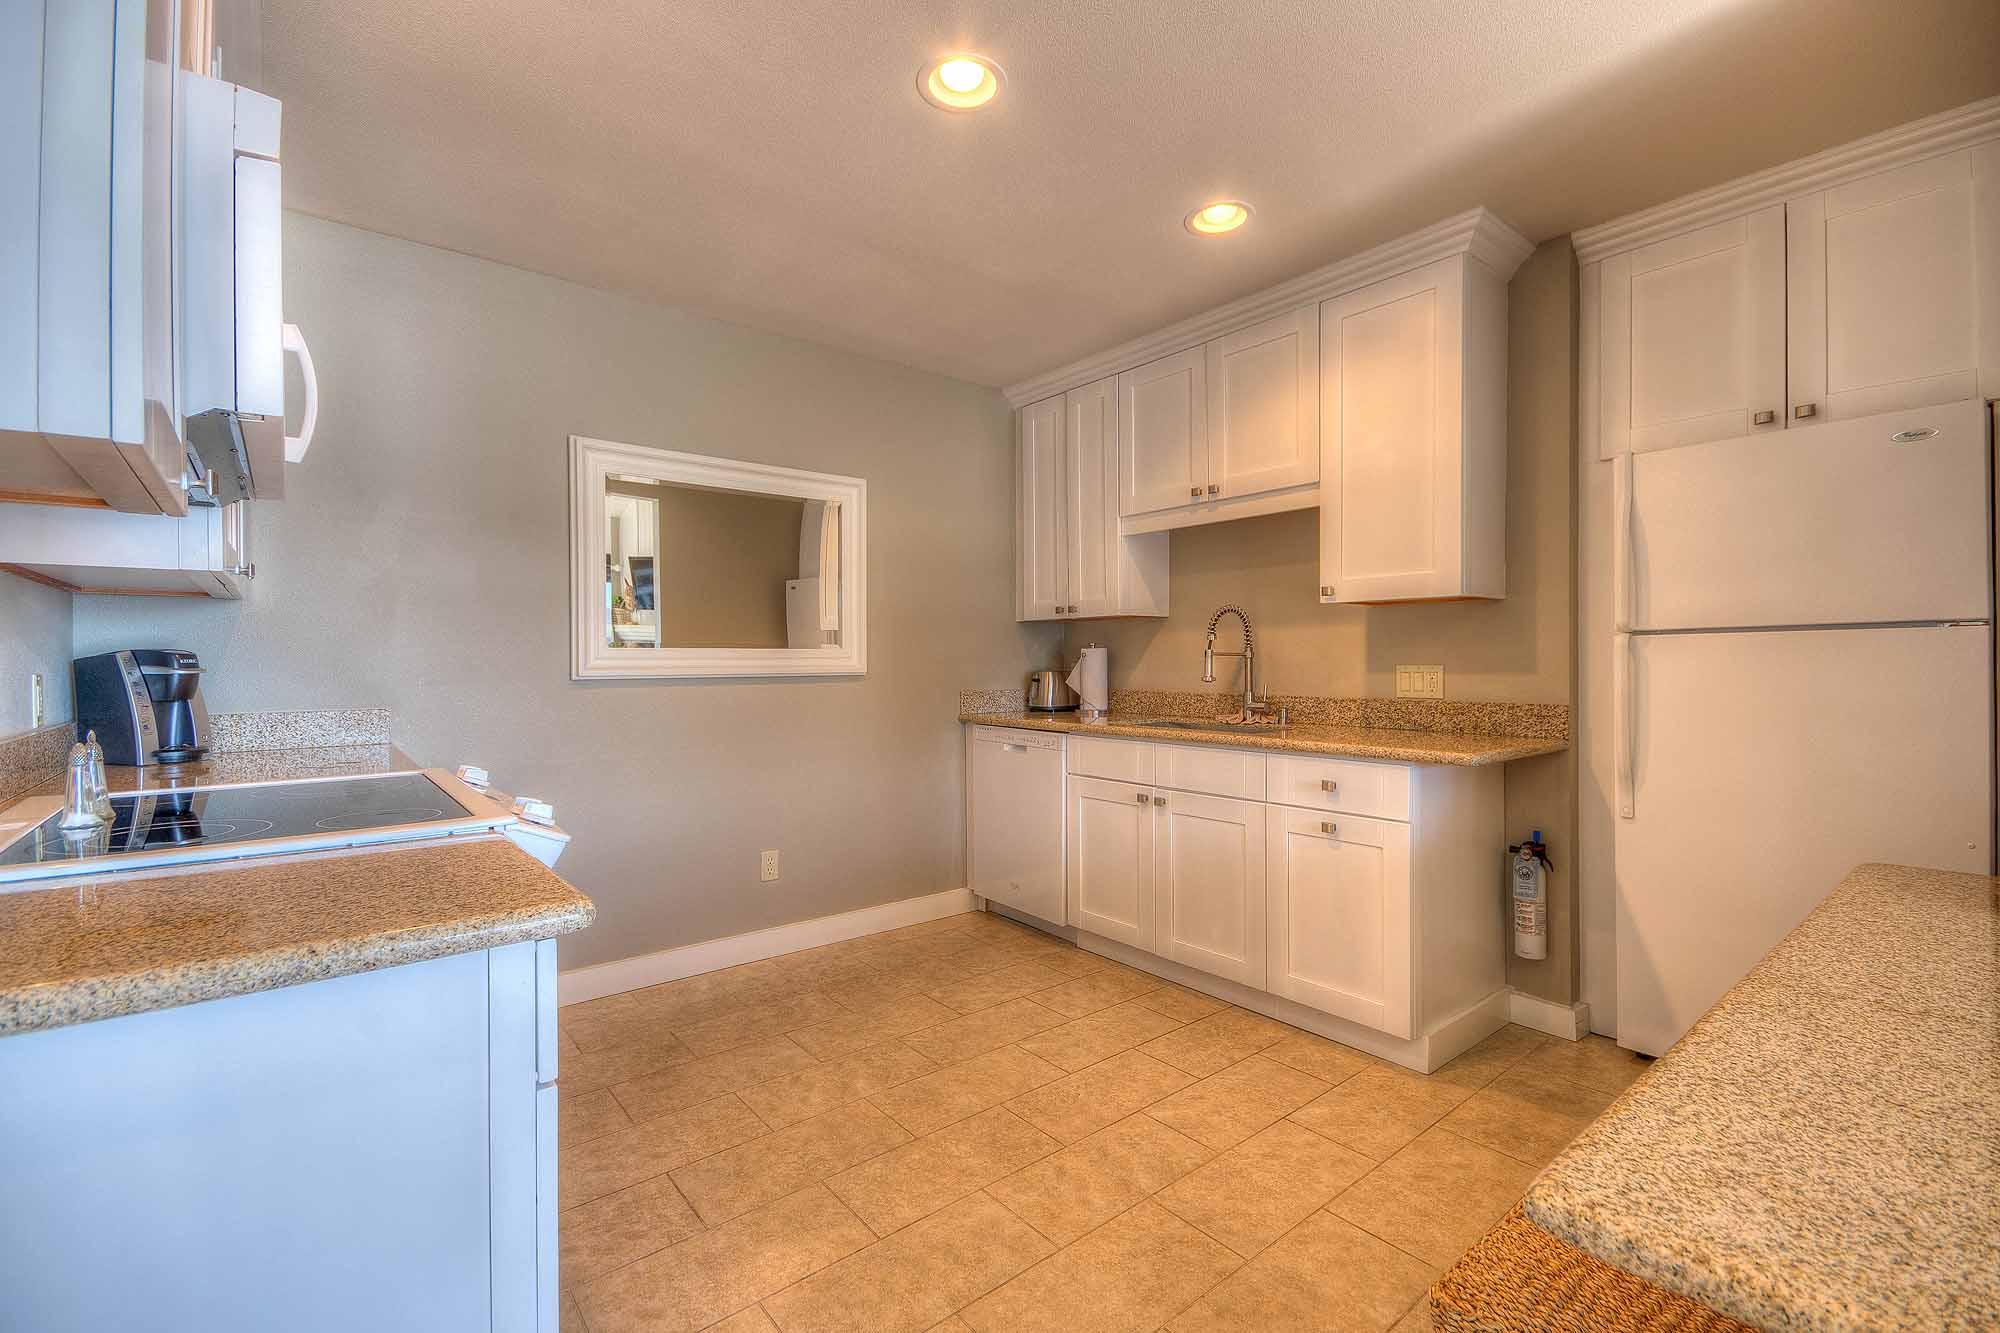 D_Hillside 2 King Suite Kitchen (5 of 32).jpg